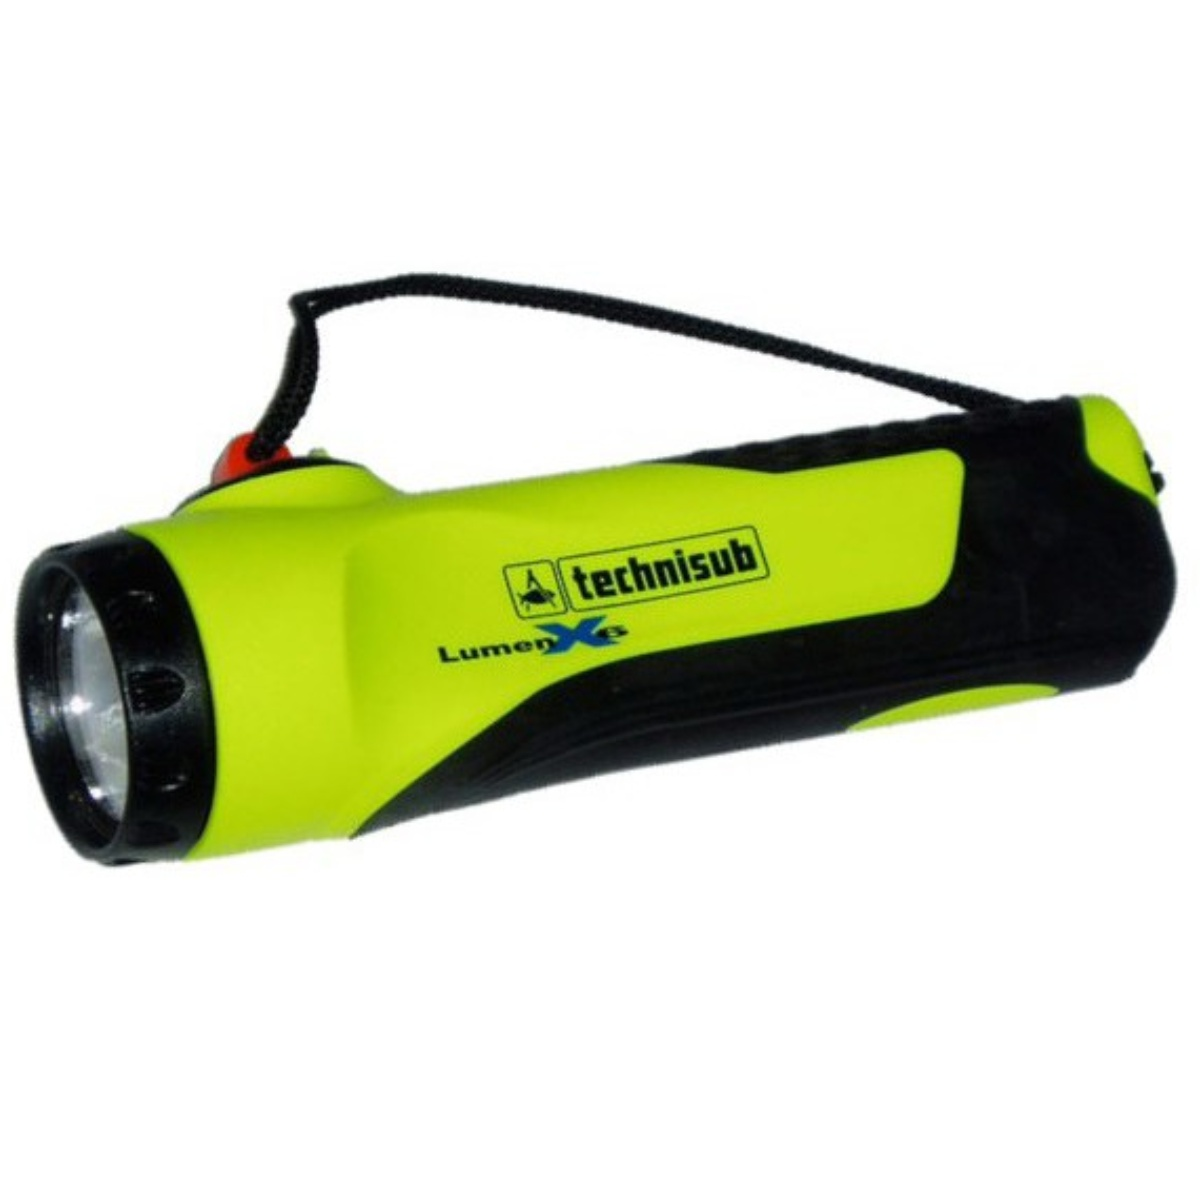 Svítilna TECHNISUB Lumen X6 - žlutá